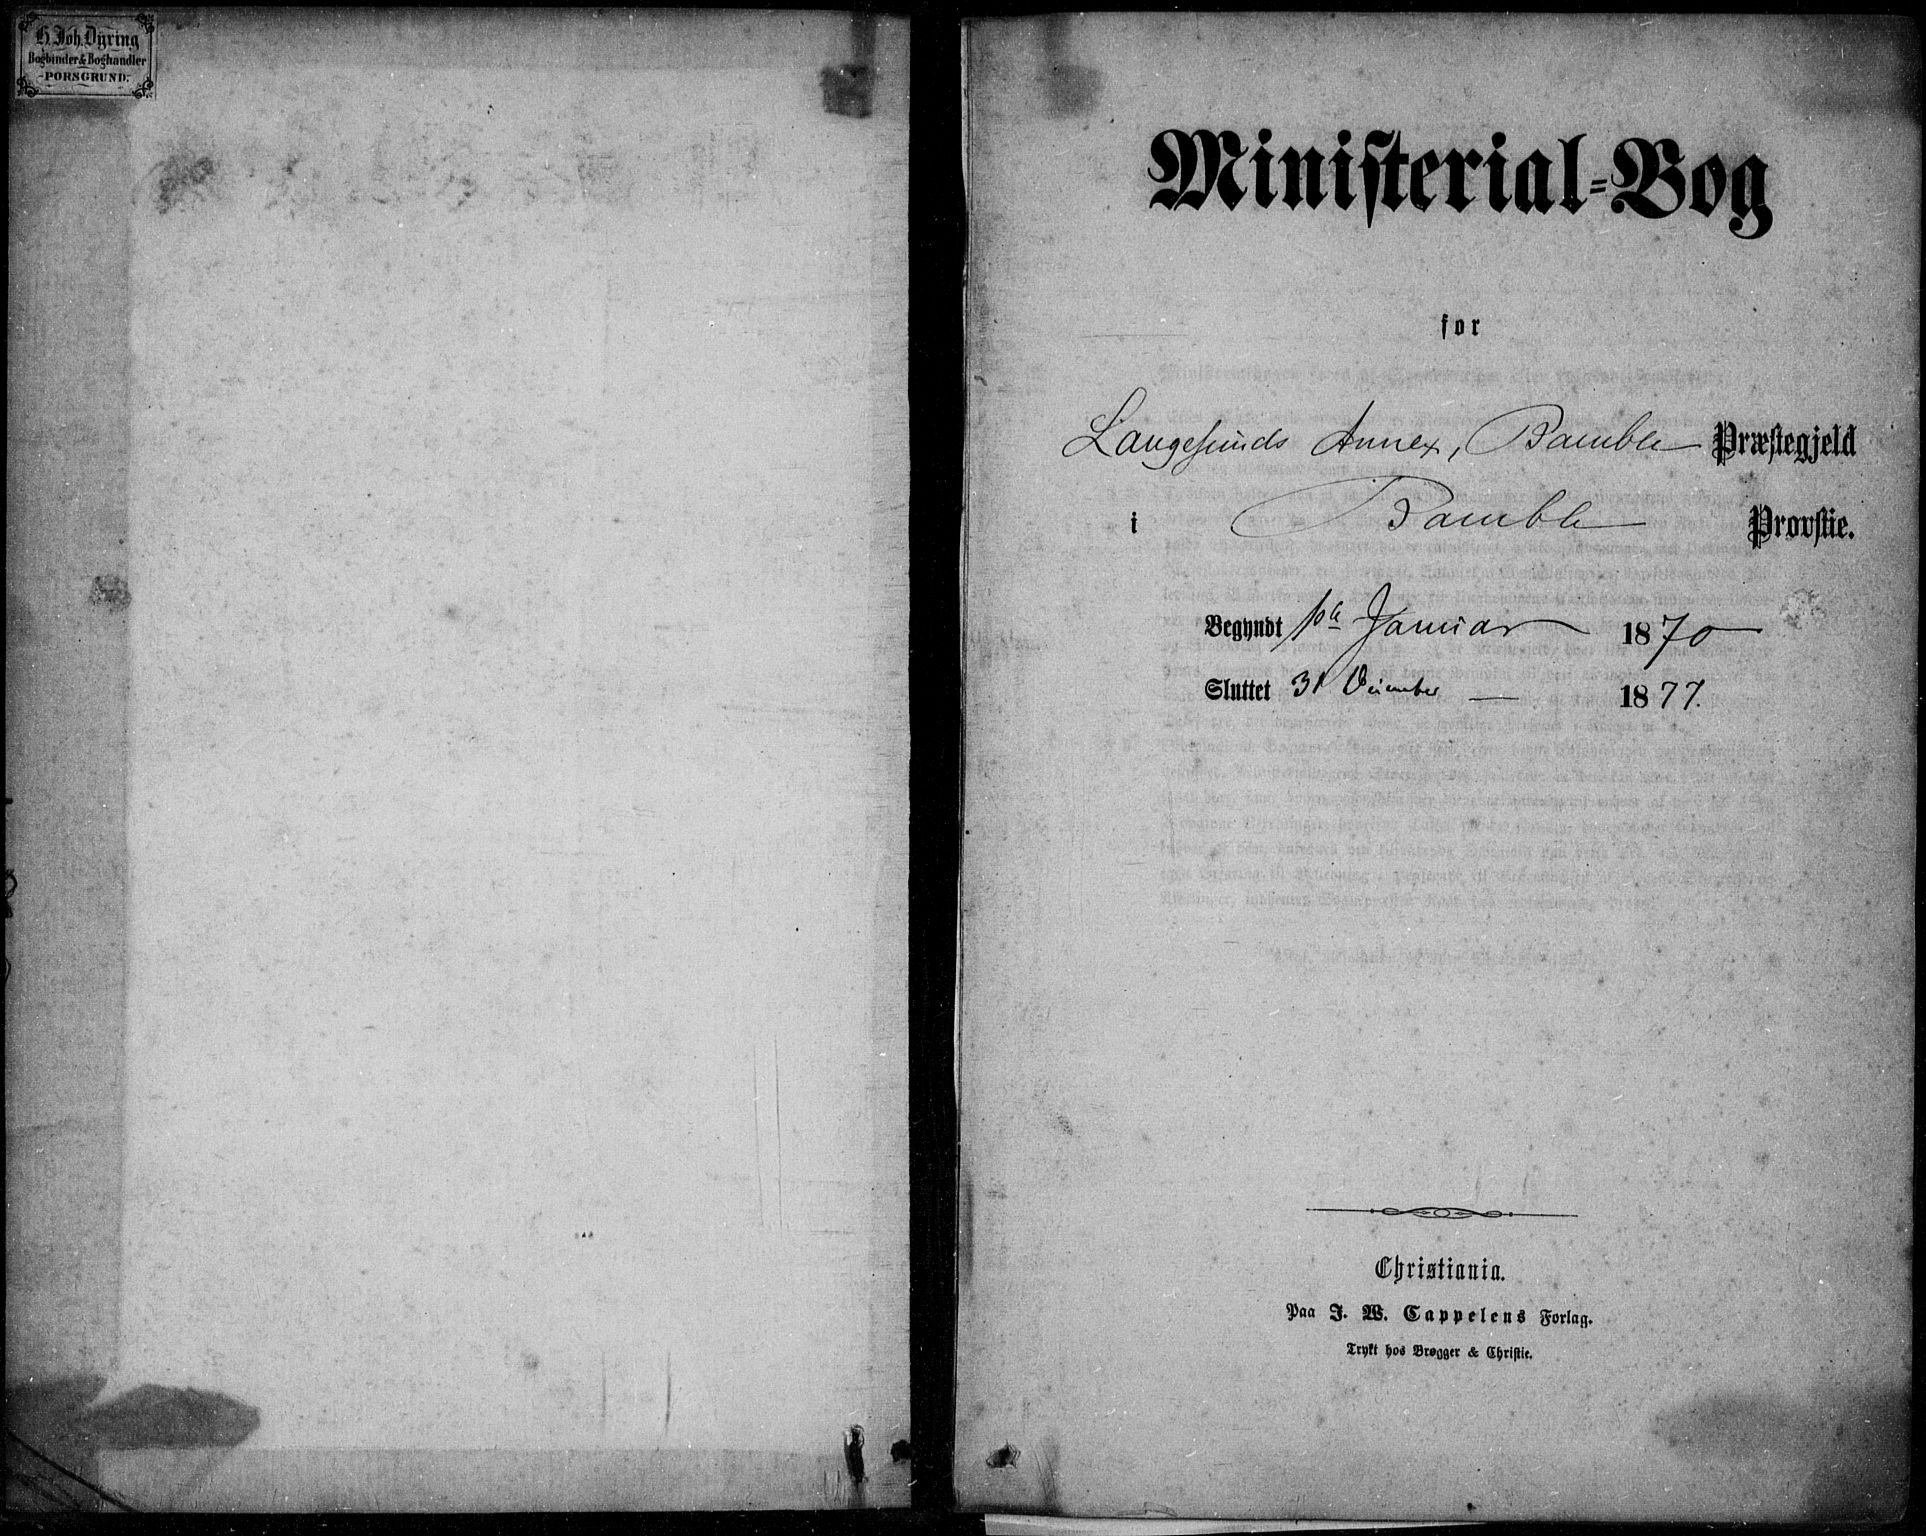 SAKO, Langesund kirkebøker, F/Fa/L0001: Ministerialbok nr. 1, 1870-1877